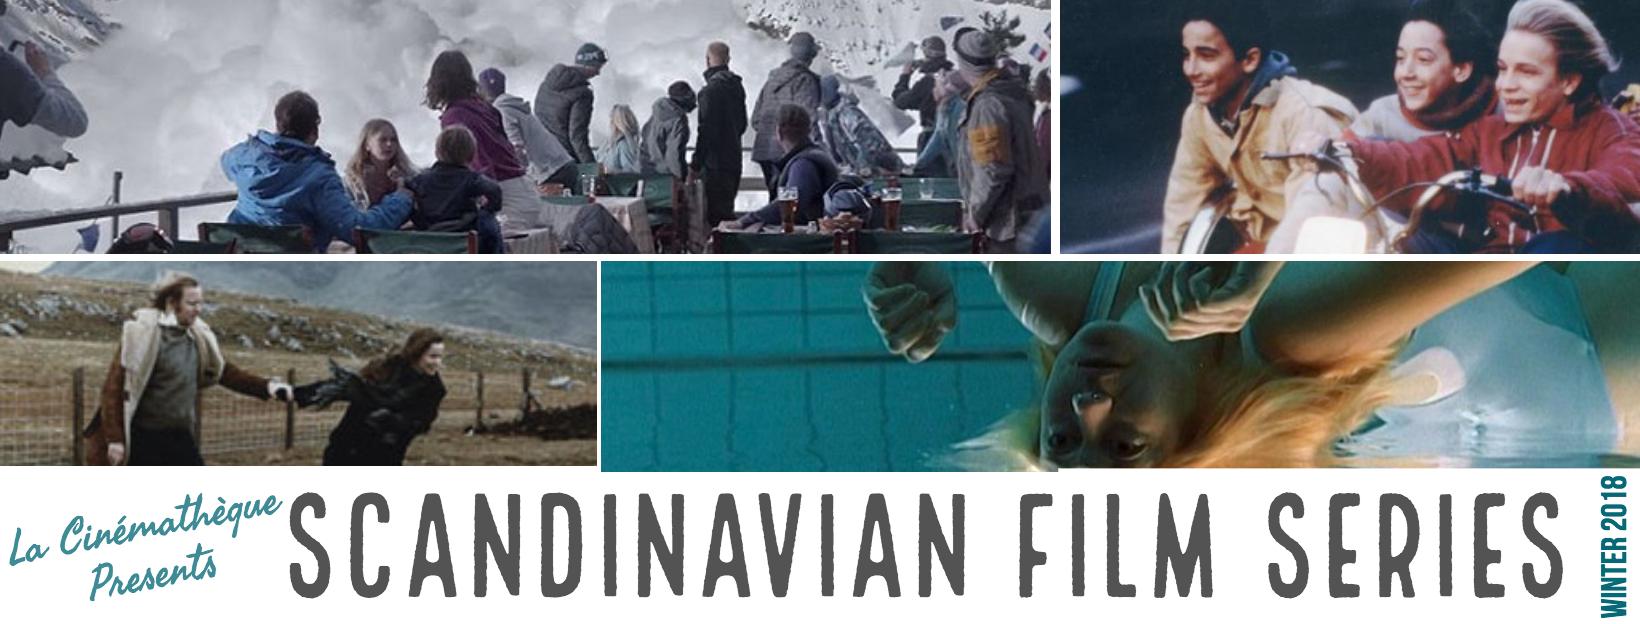 2018 Scandinavian FB COVER.jpg